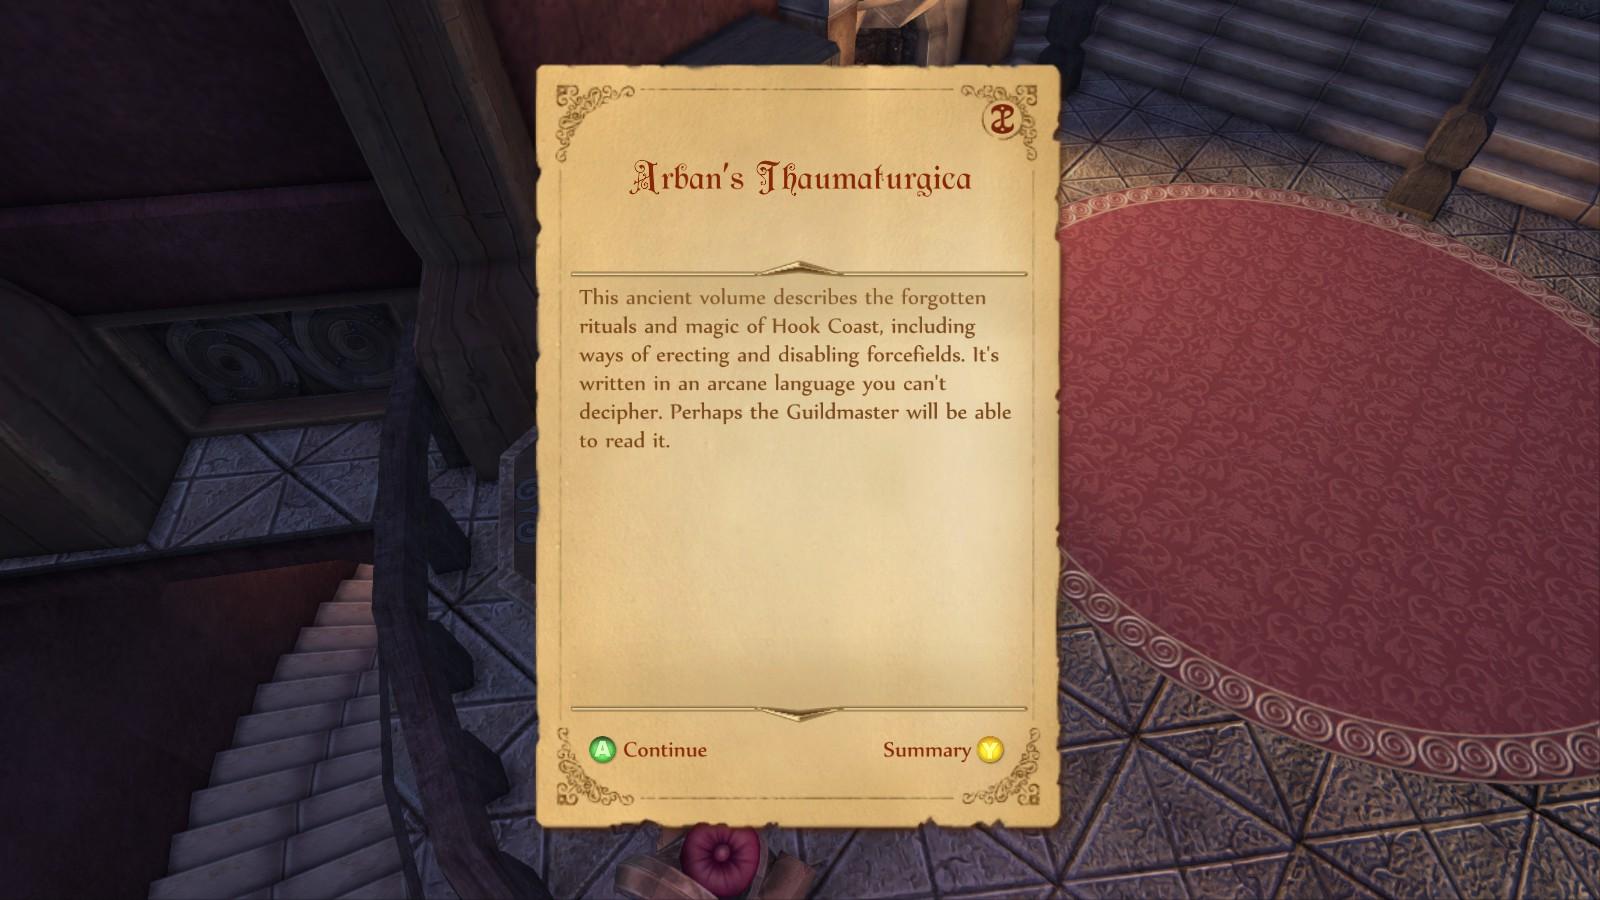 Arban's Thaumaturgica